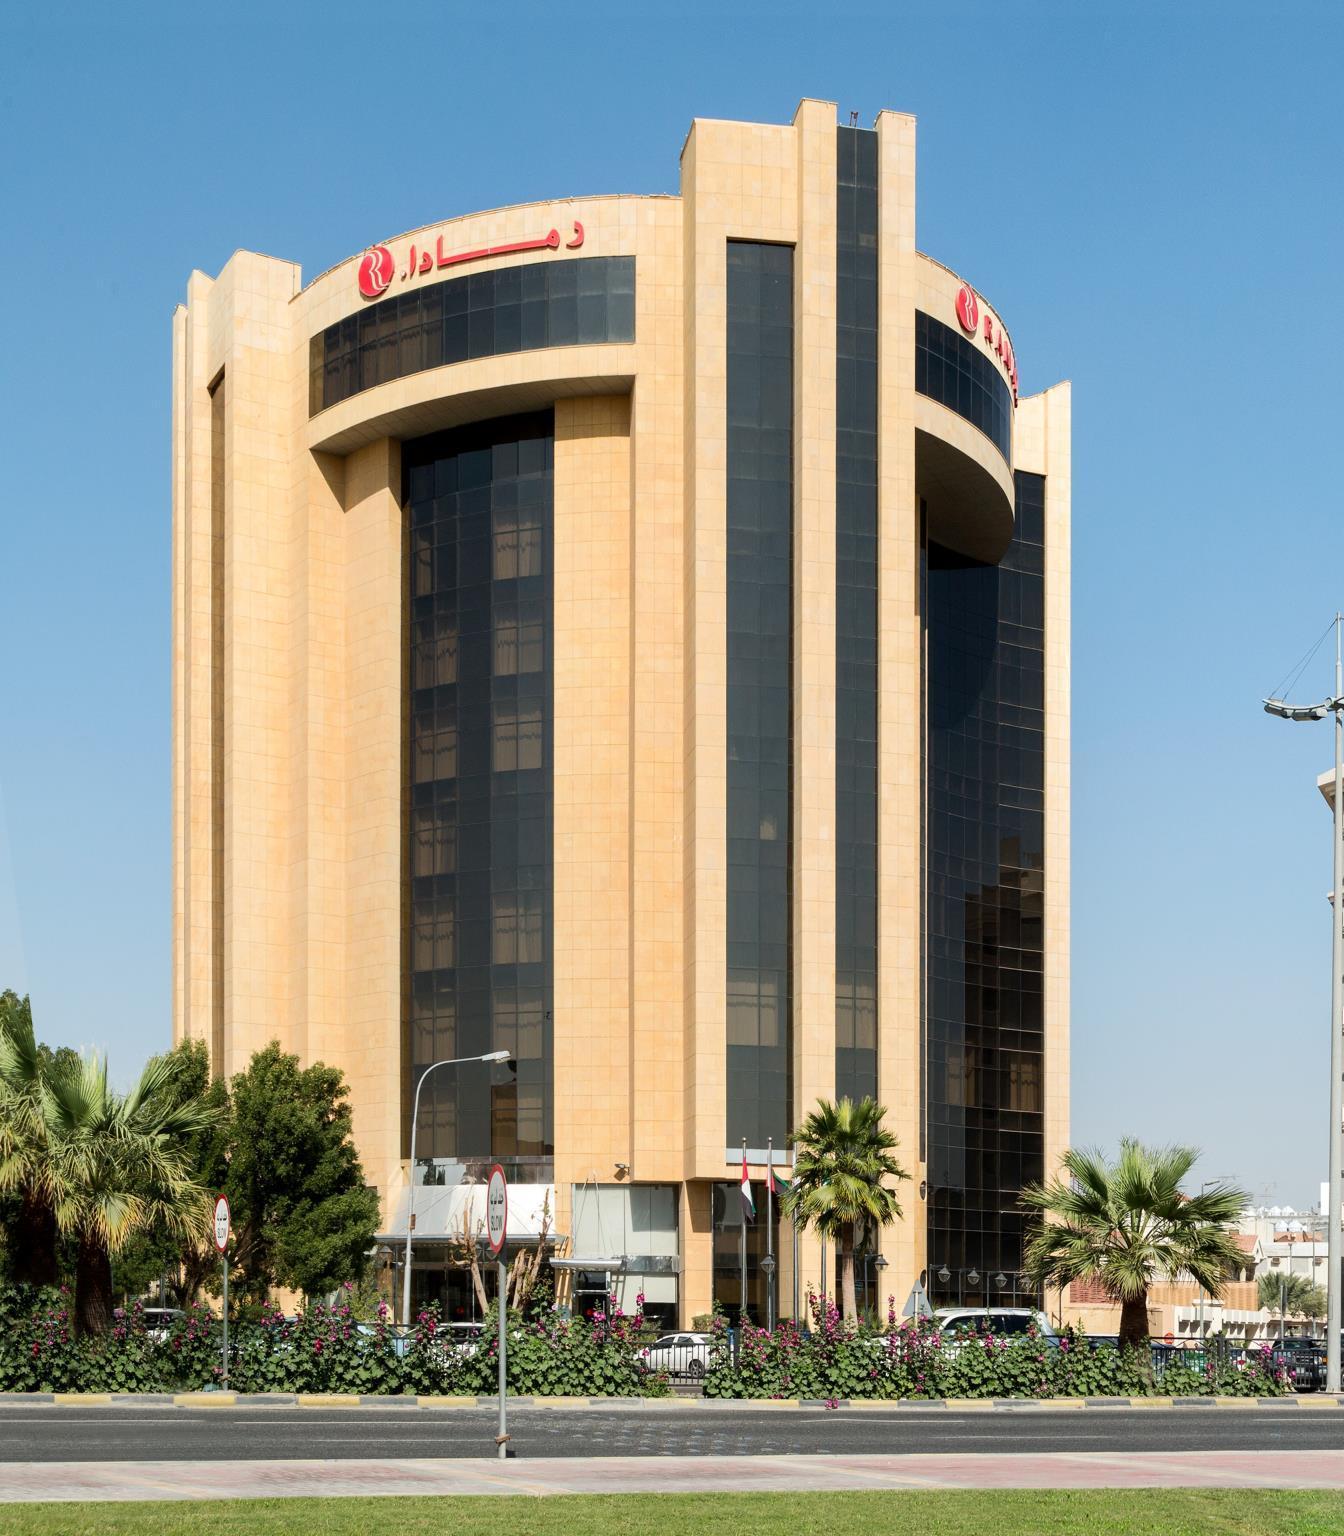 10 best al khobar hotels hd photos reviews of hotels in al khobar rh agoda com